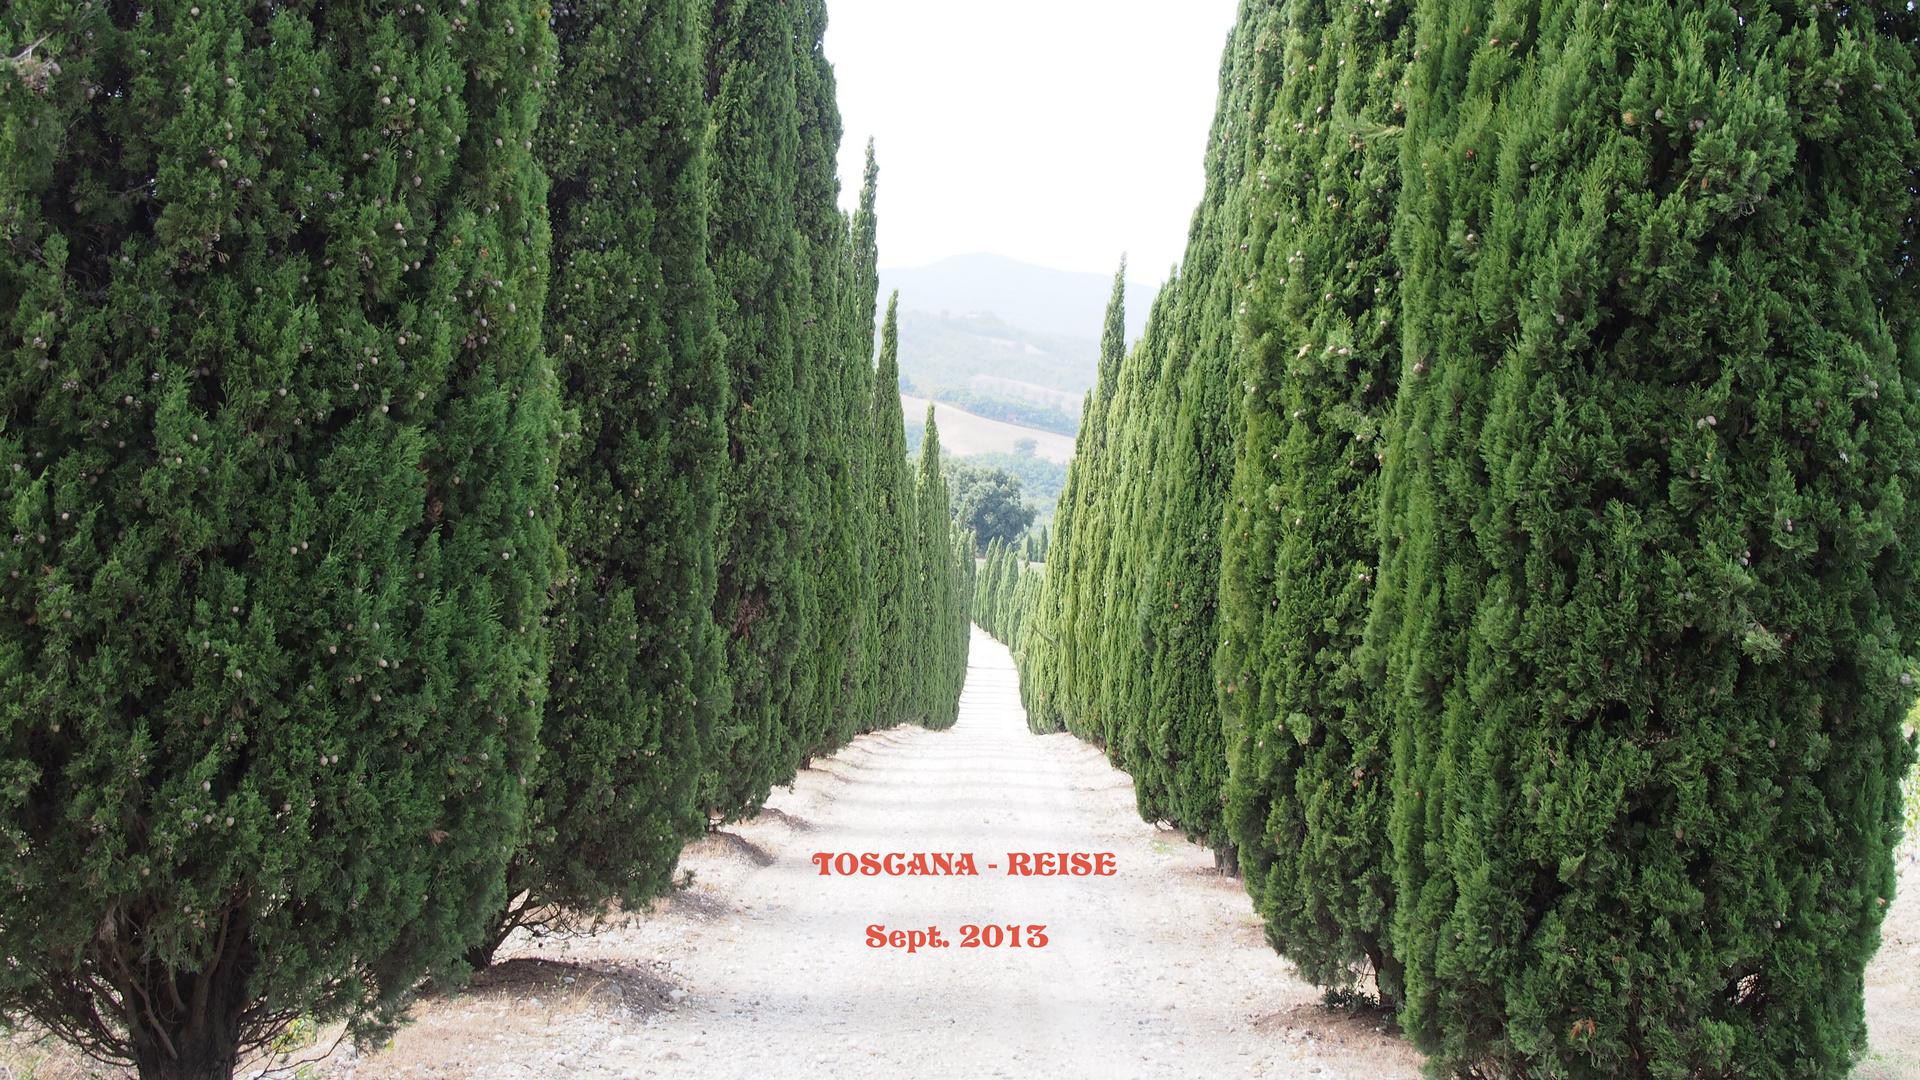 Toscana-Reise 2013